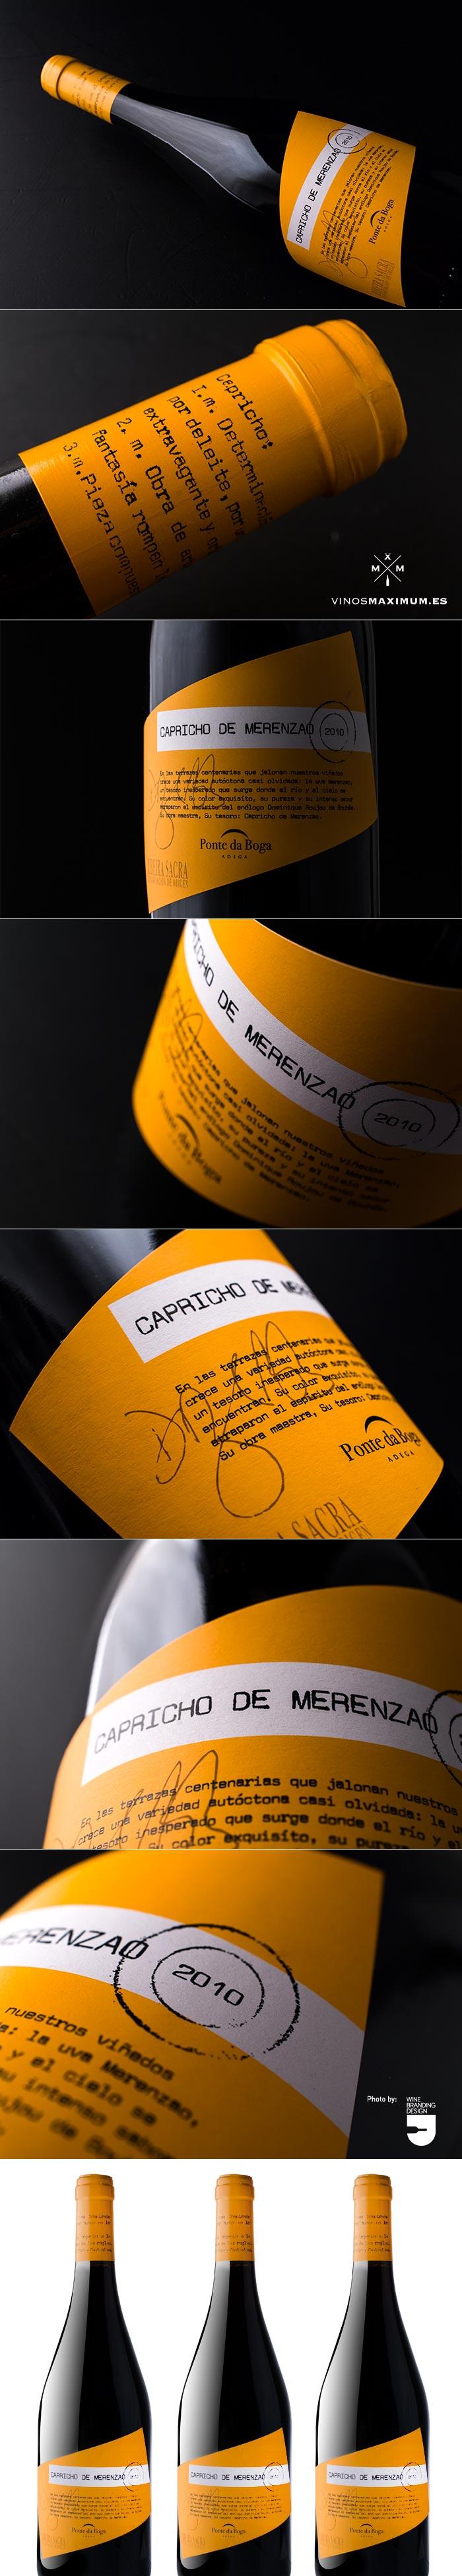 Capricho de merenzao 2010 Ponte da Boga Adega -  #taninotanino #vinosmaximum